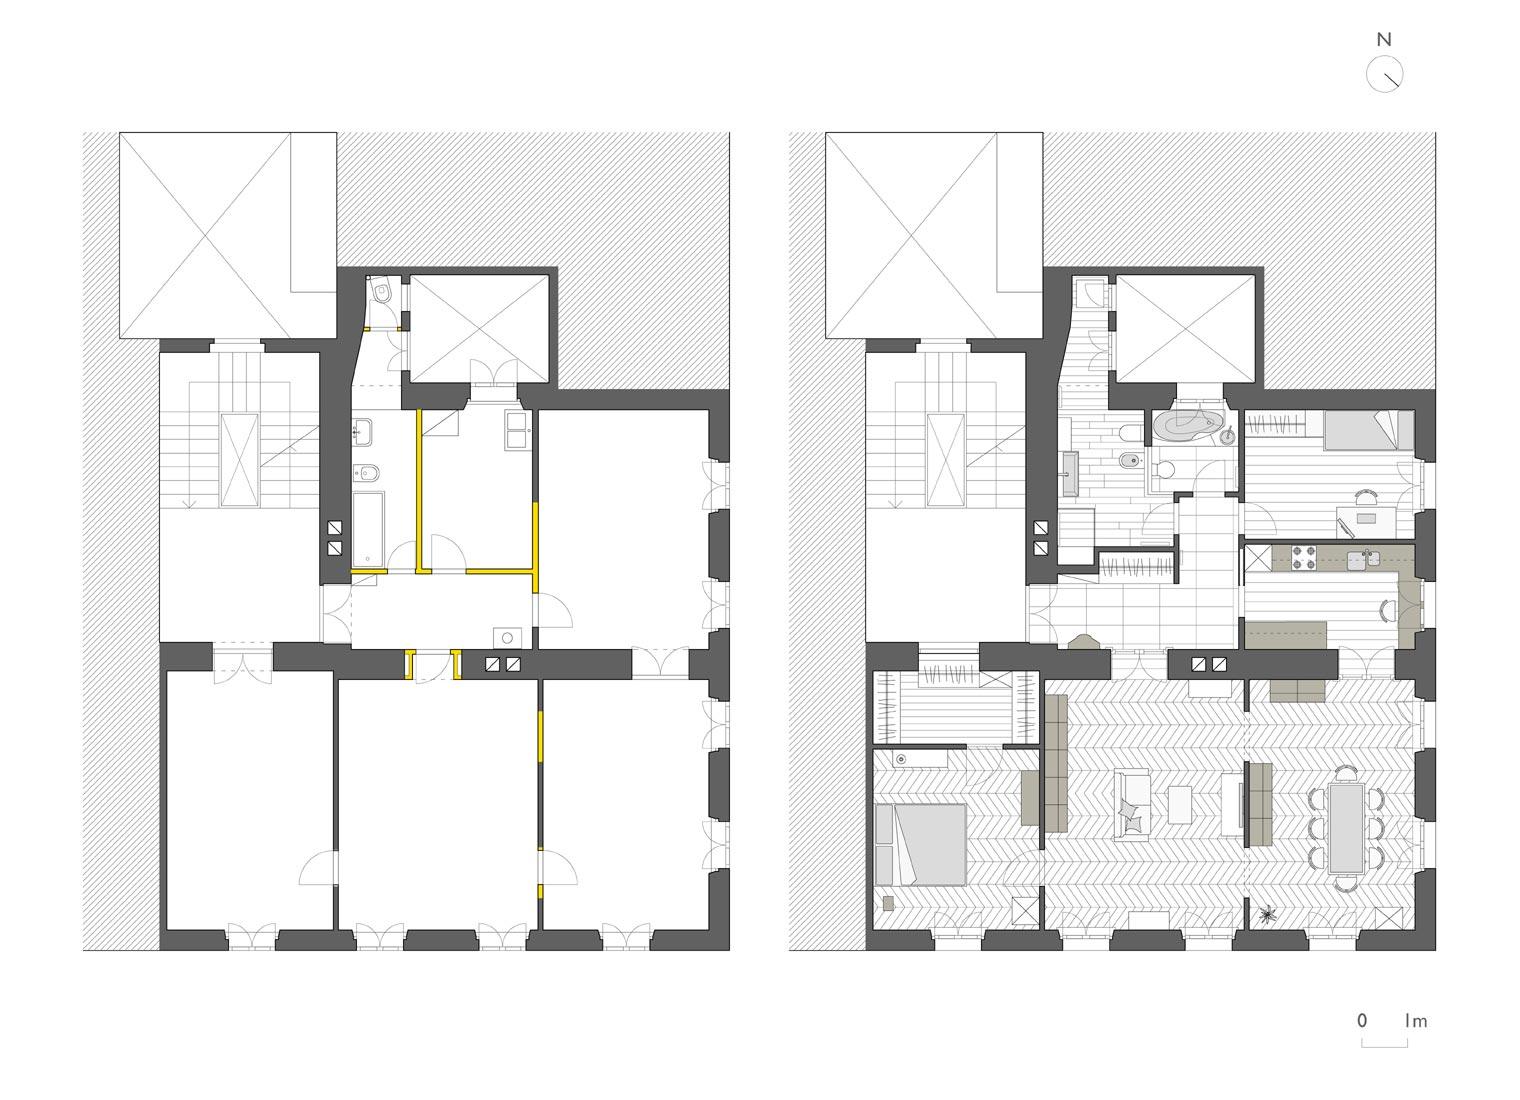 vk-architetti_casak_plan